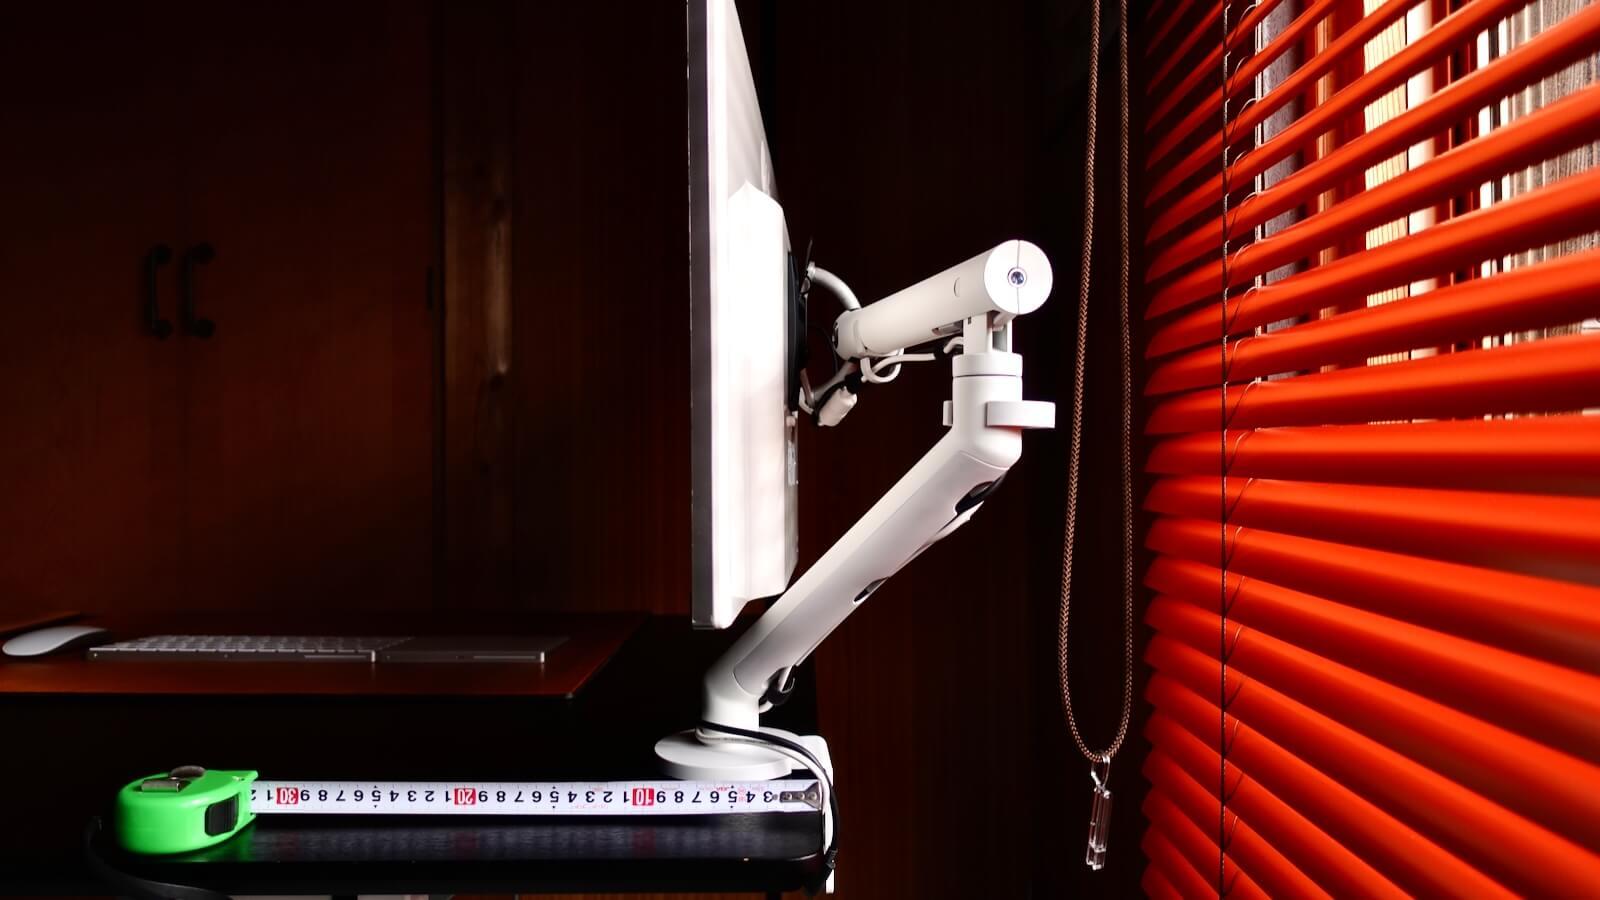 Herman Miller Flo Monitor Arm Operating Range Depth 10 cm